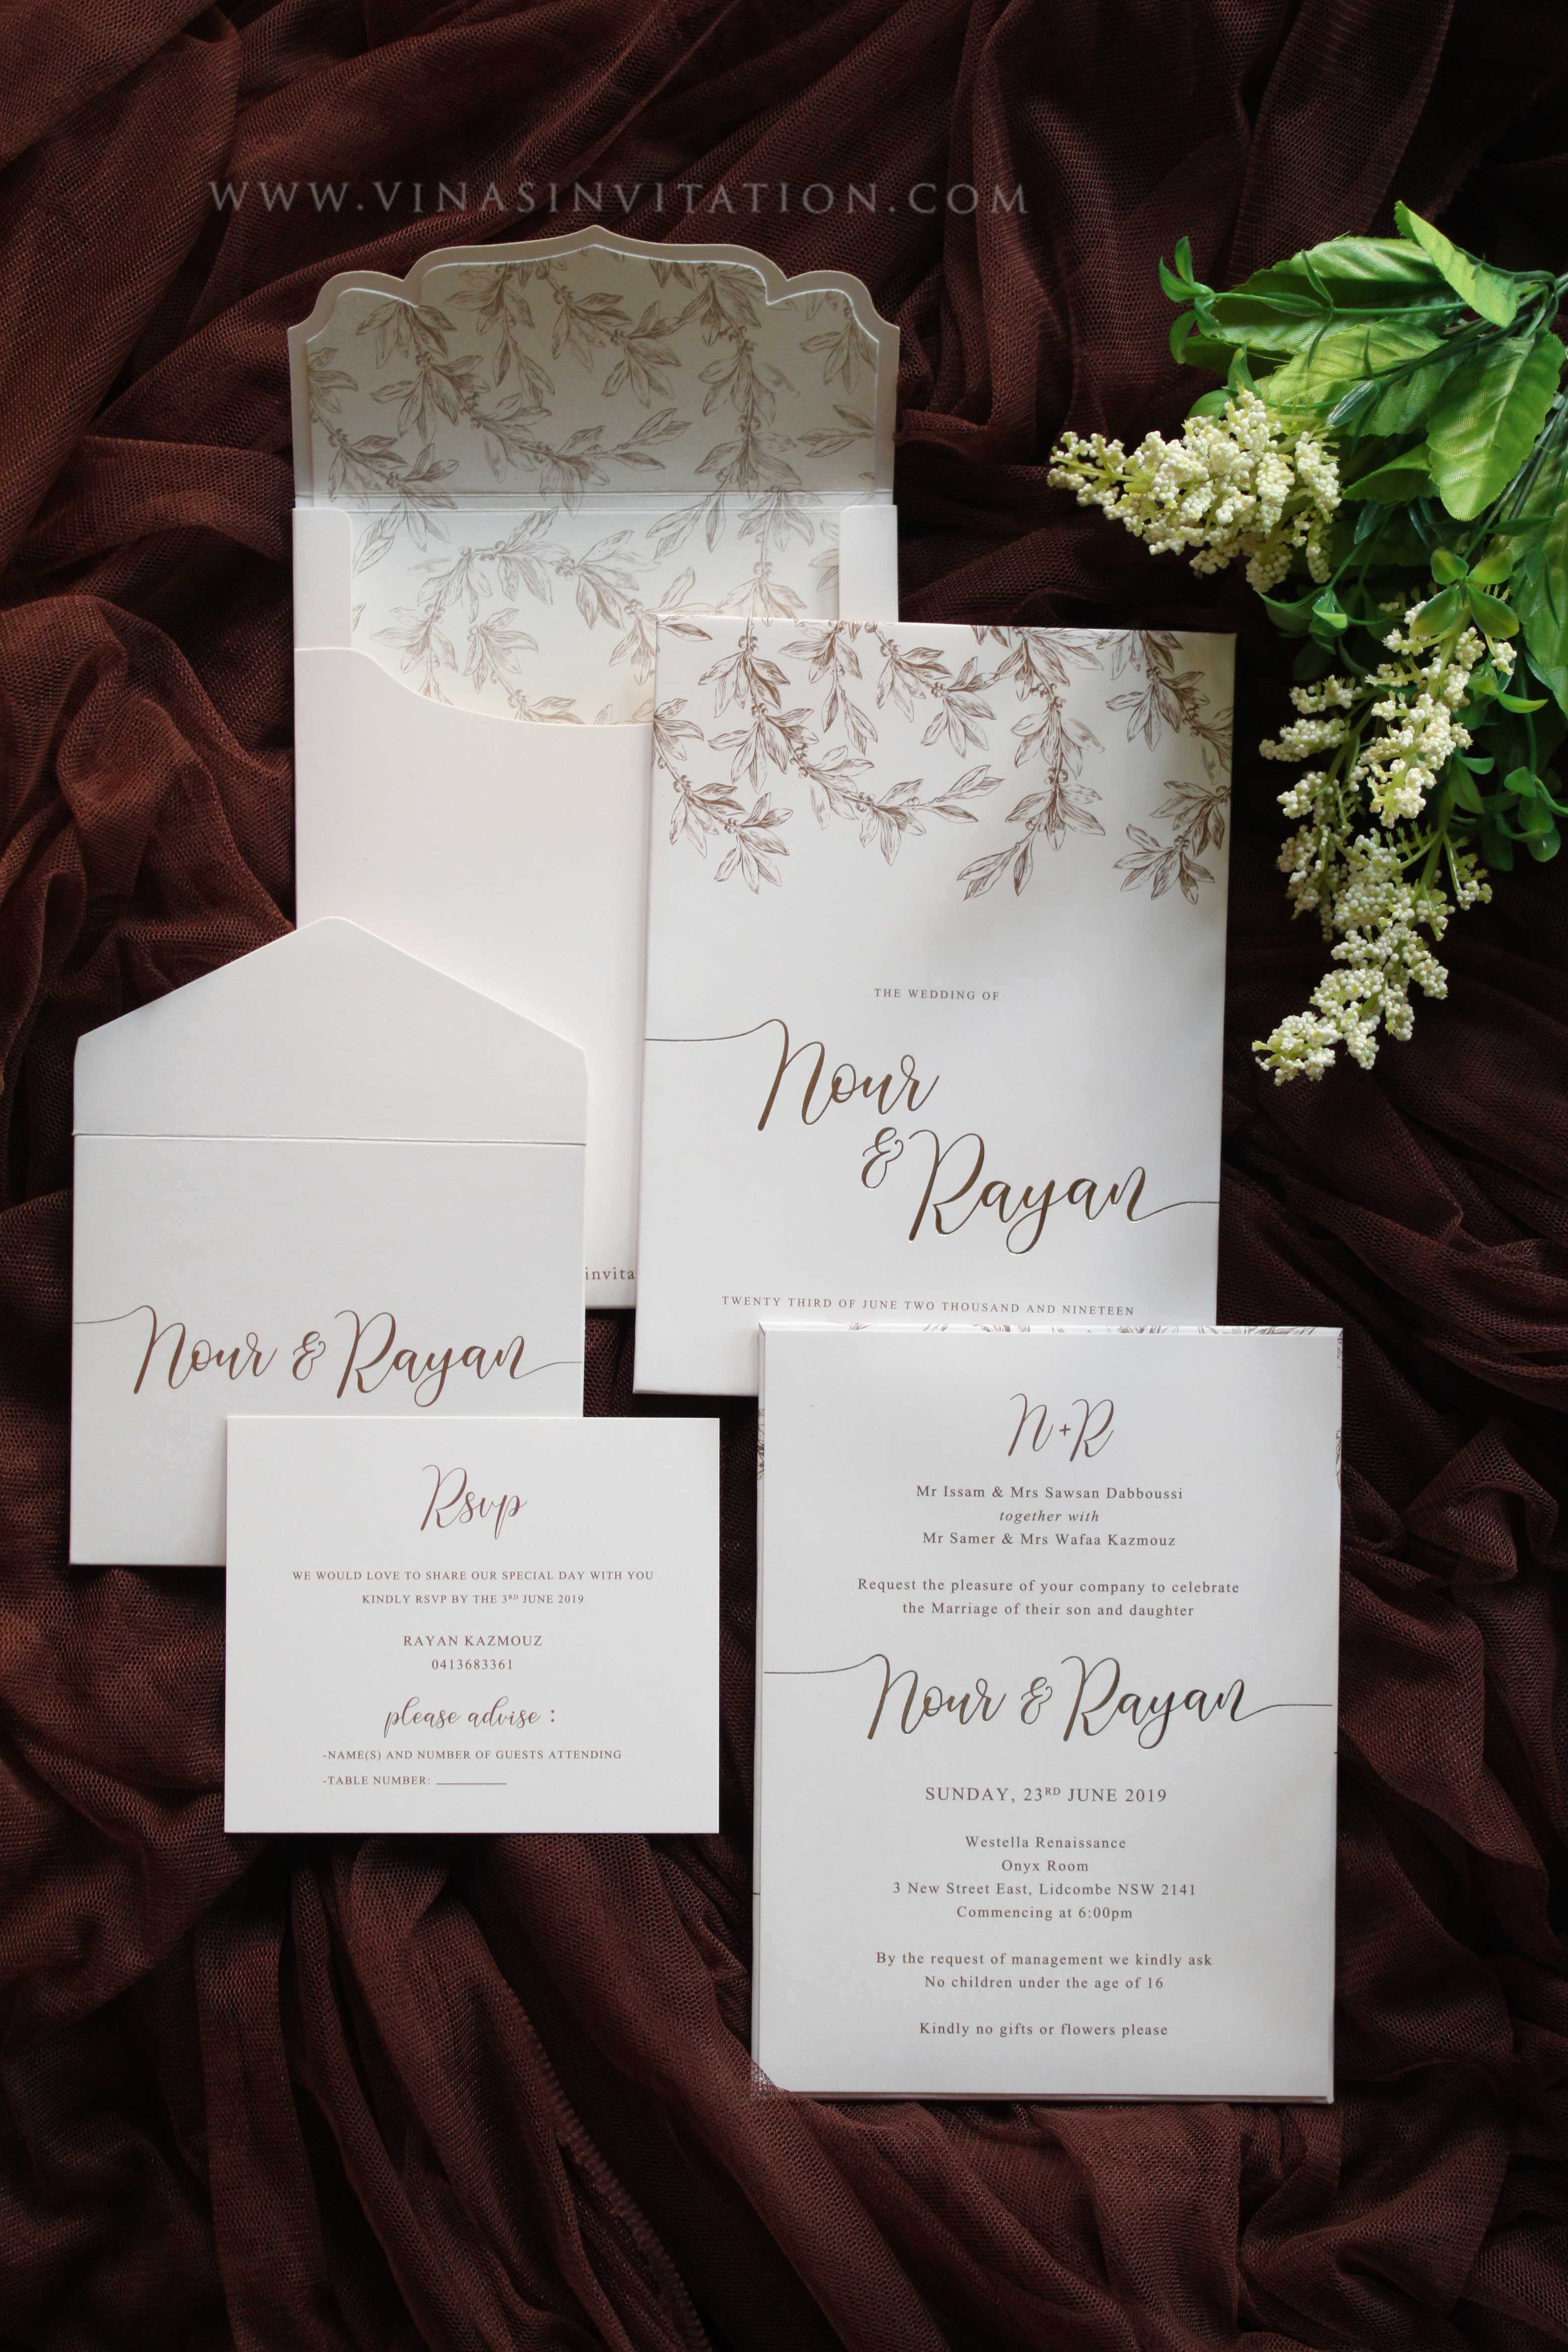 Nour Rayan By Vinas Invitation Bridestory Com